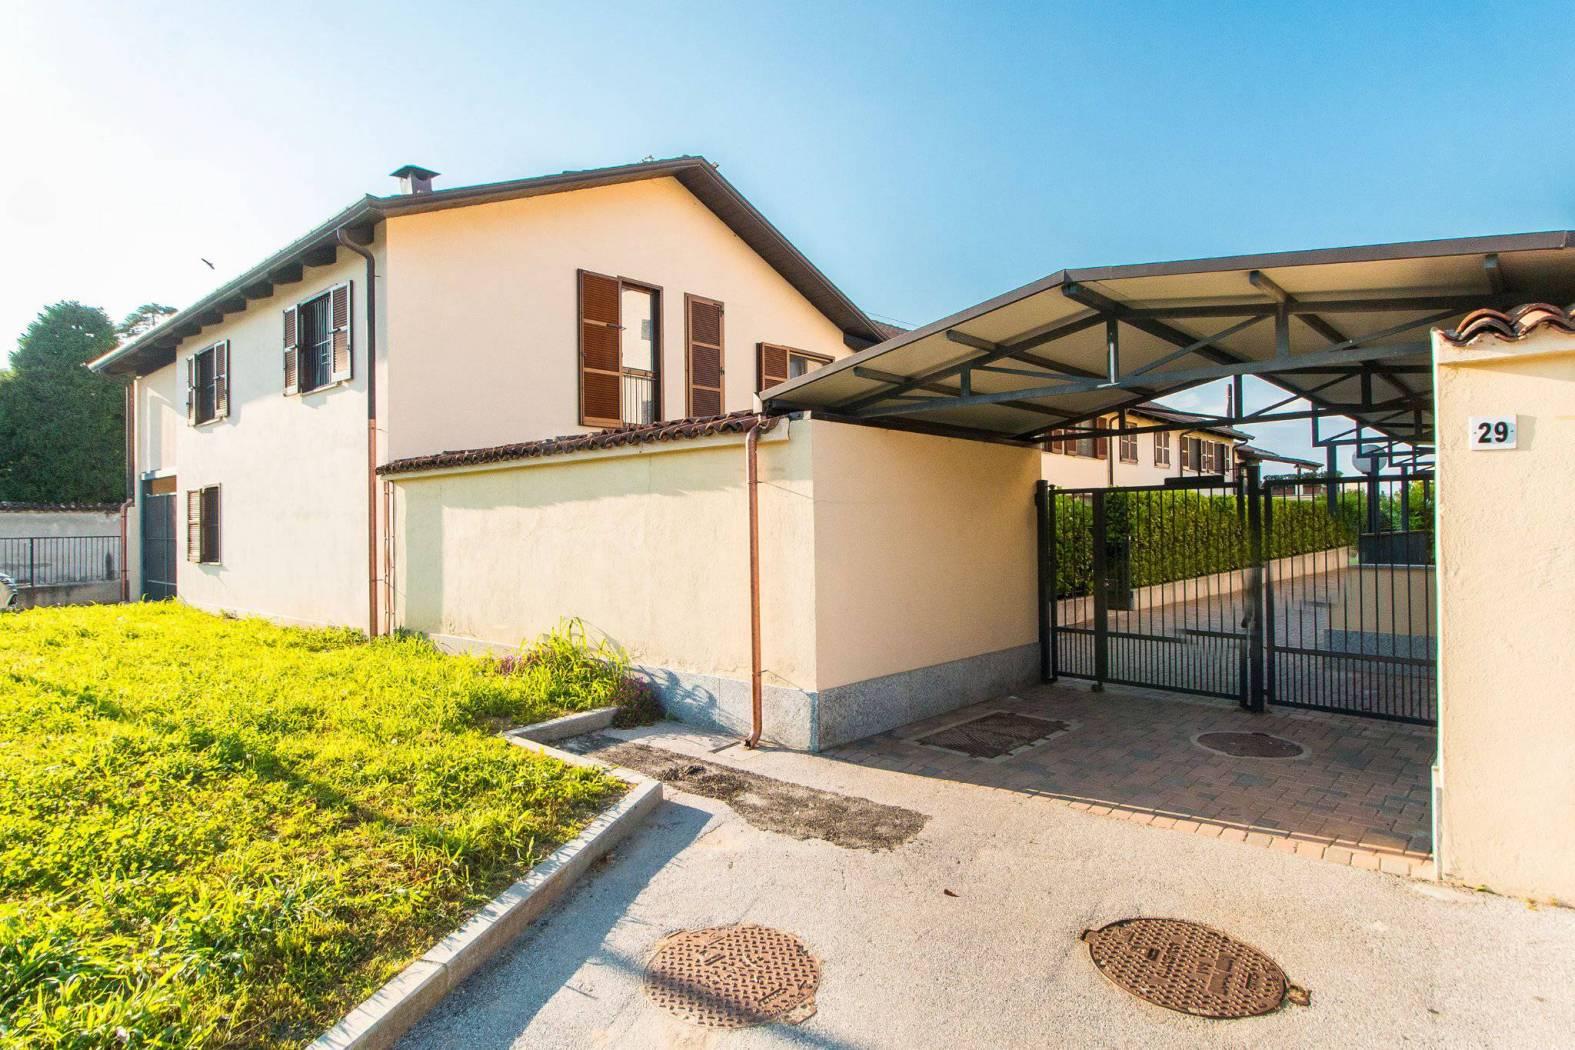 Villa a schiera via Moncalieri 29, Grugliasco